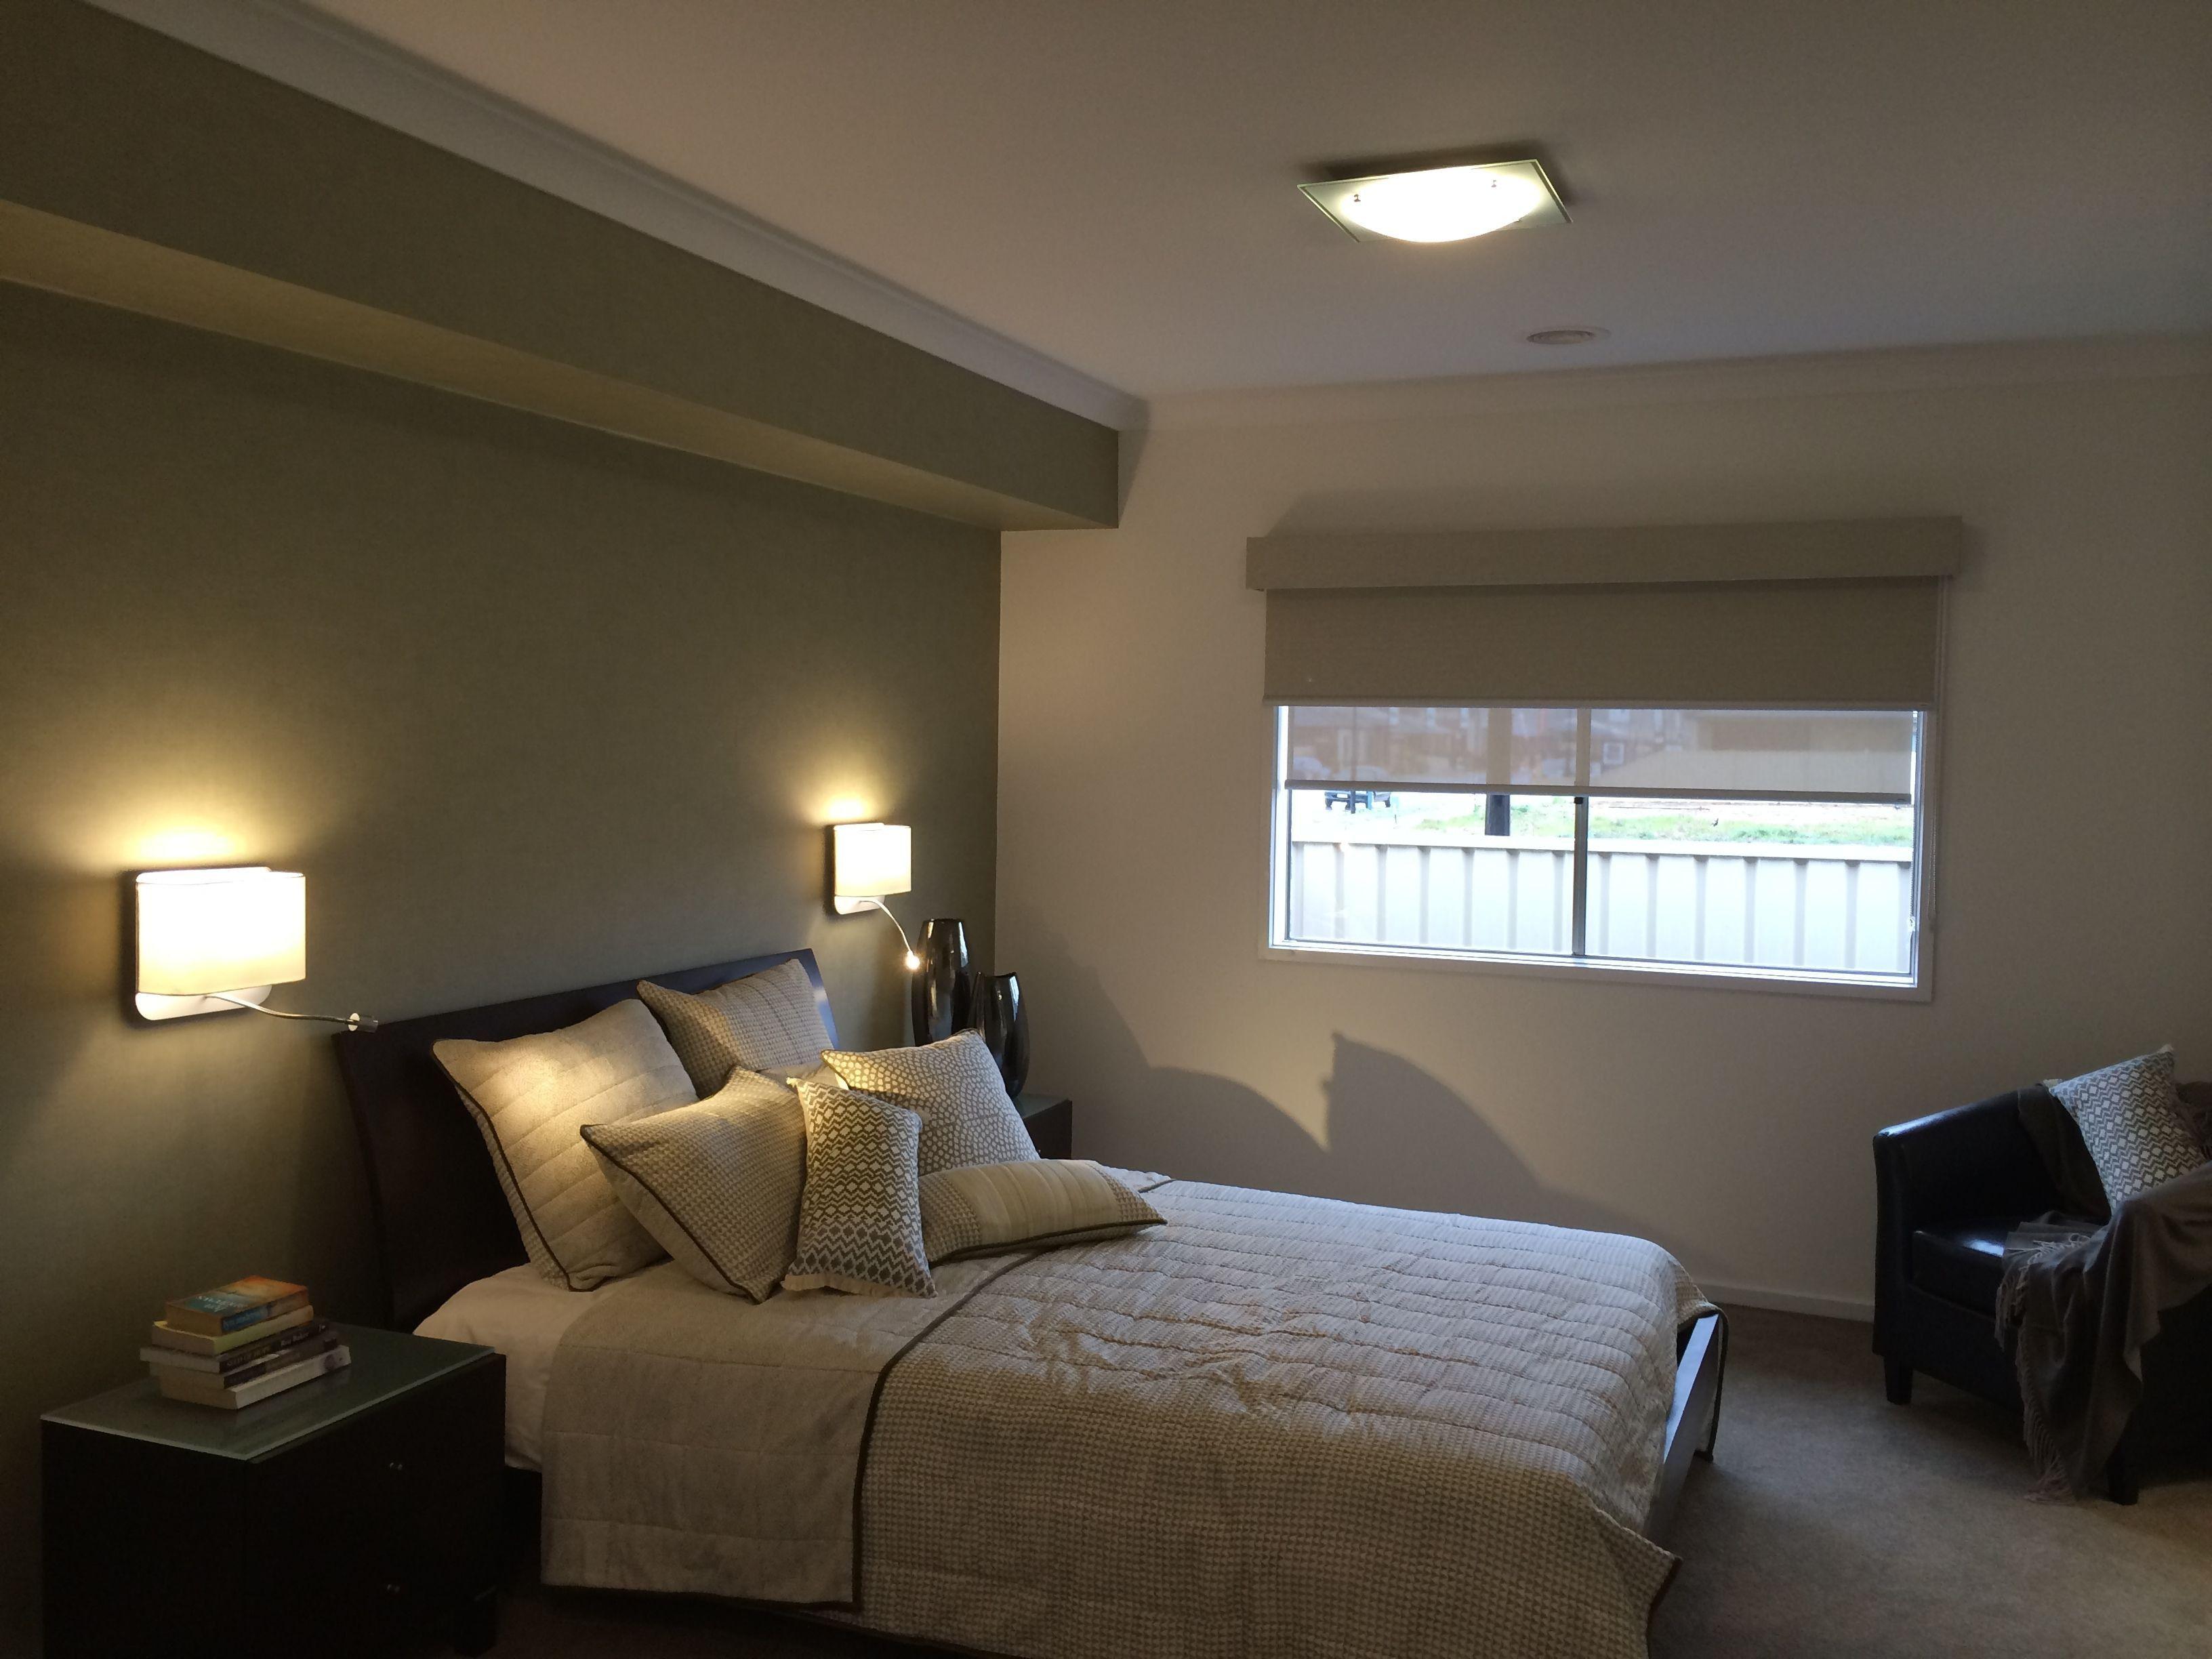 Modern Bedroom Light Fittings Bedroom Design Pinterest Cool New Latest Bedroom Desig Bedroom Light Fittings Modern Bedroom Lighting Contemporary Bedroom Design